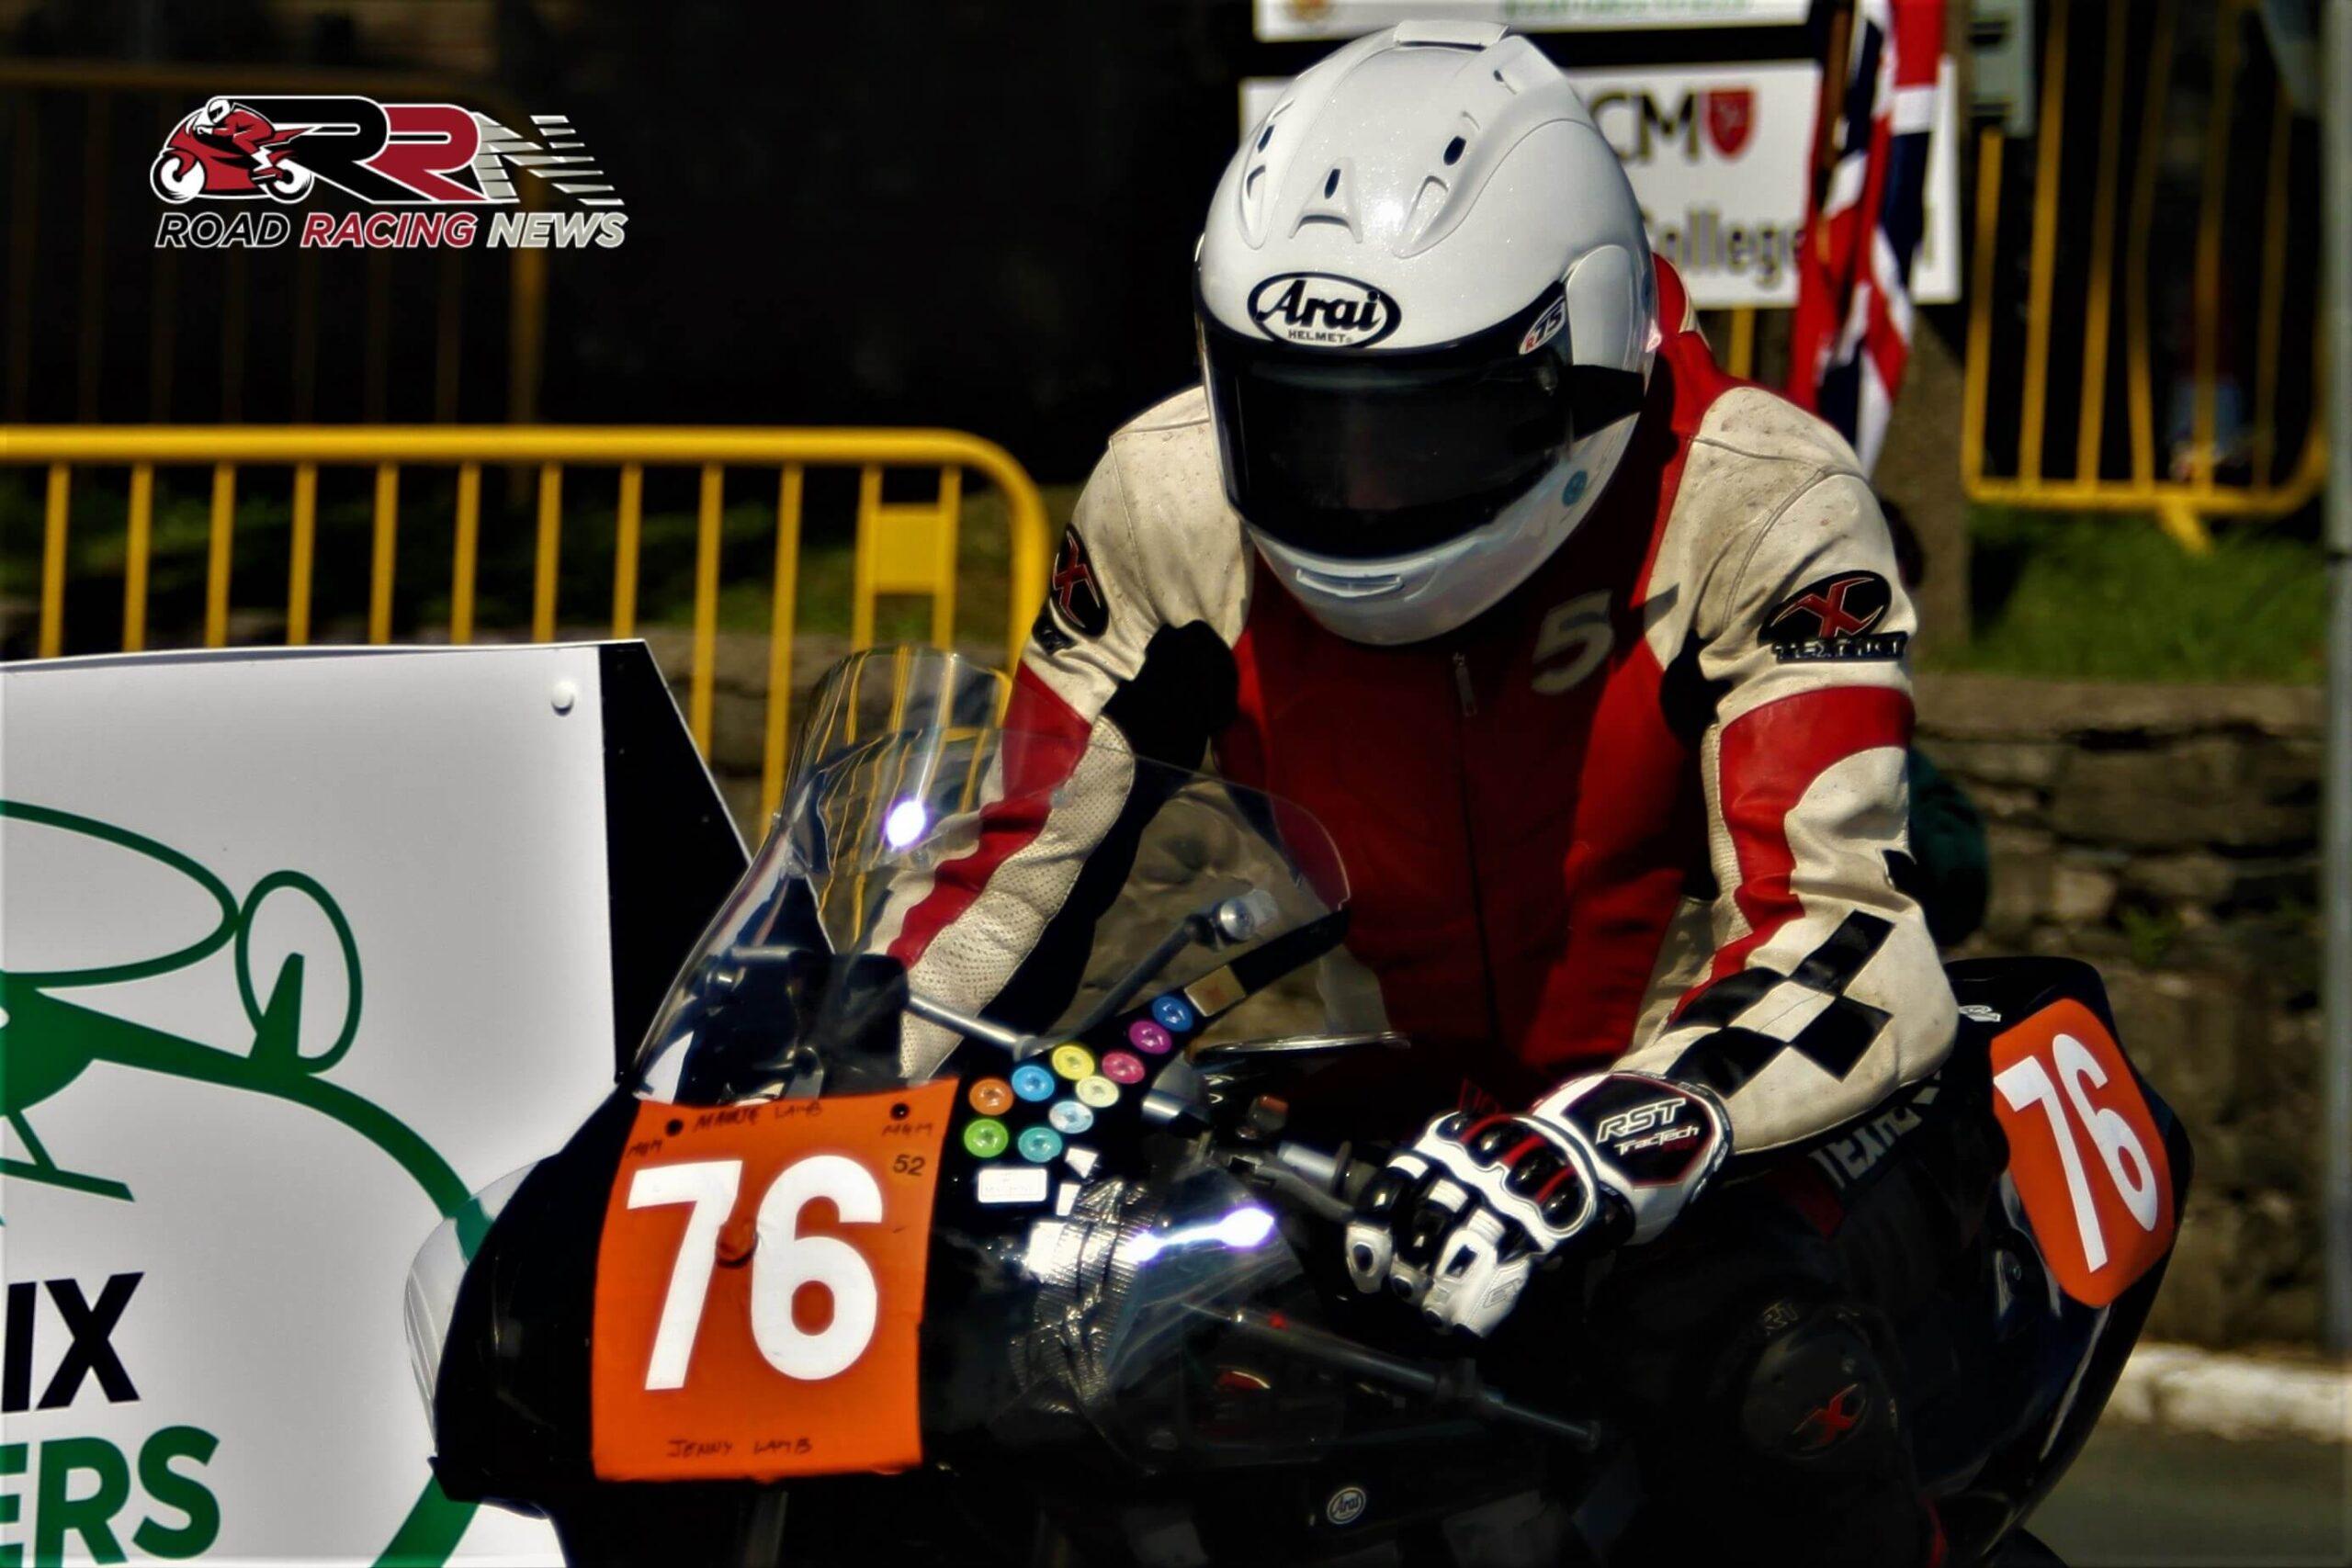 Manx GP Top 6: Jason Lamb